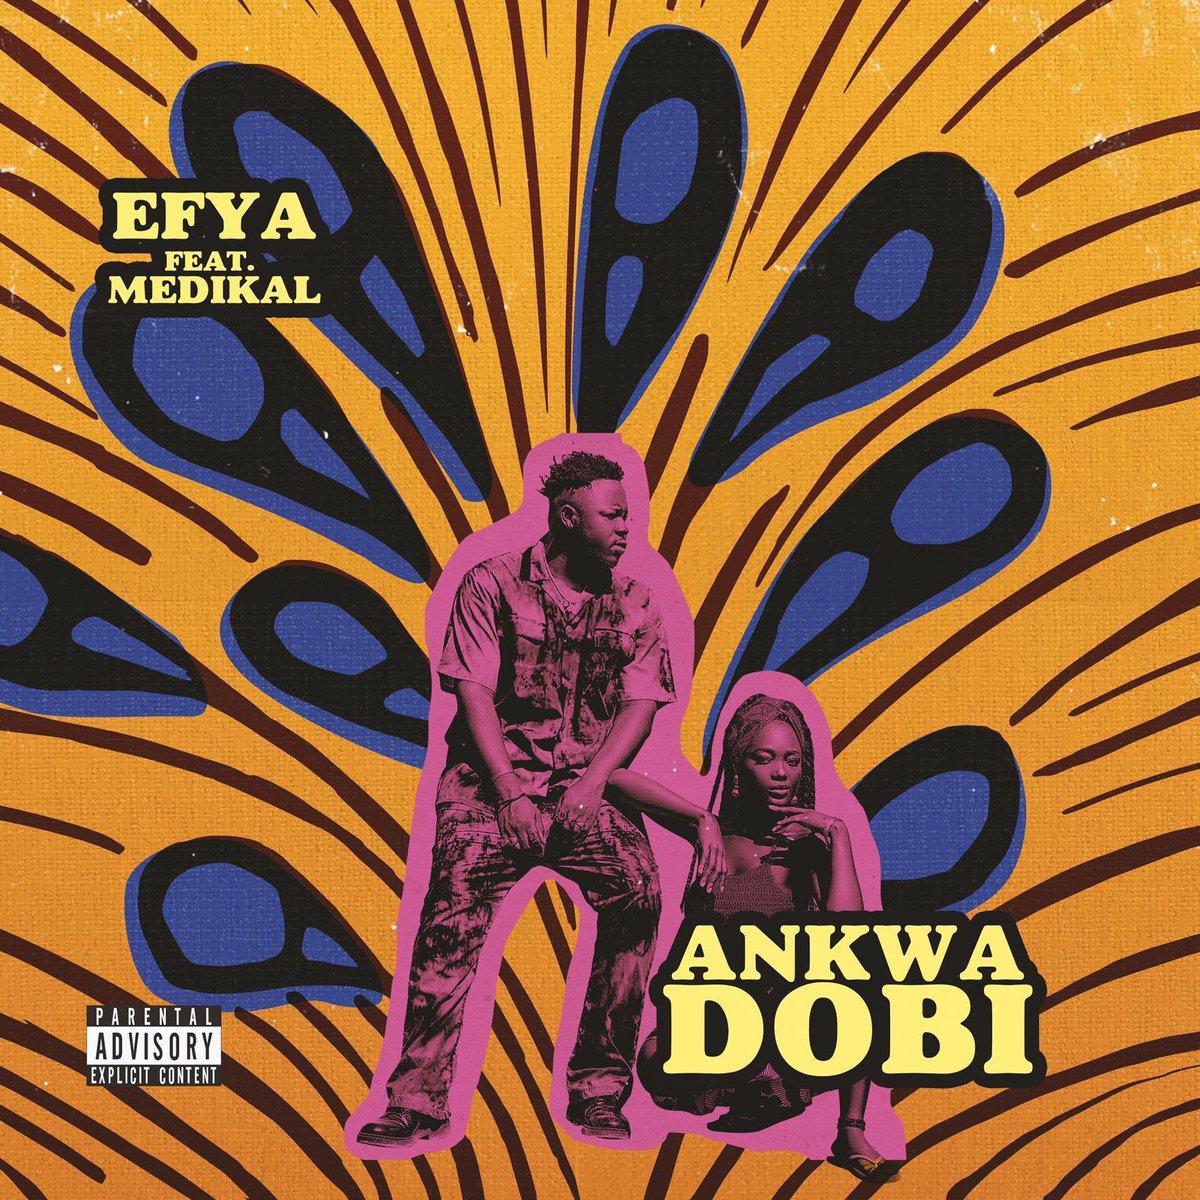 Efya – Ankwa Dobi (feat. Medikal)